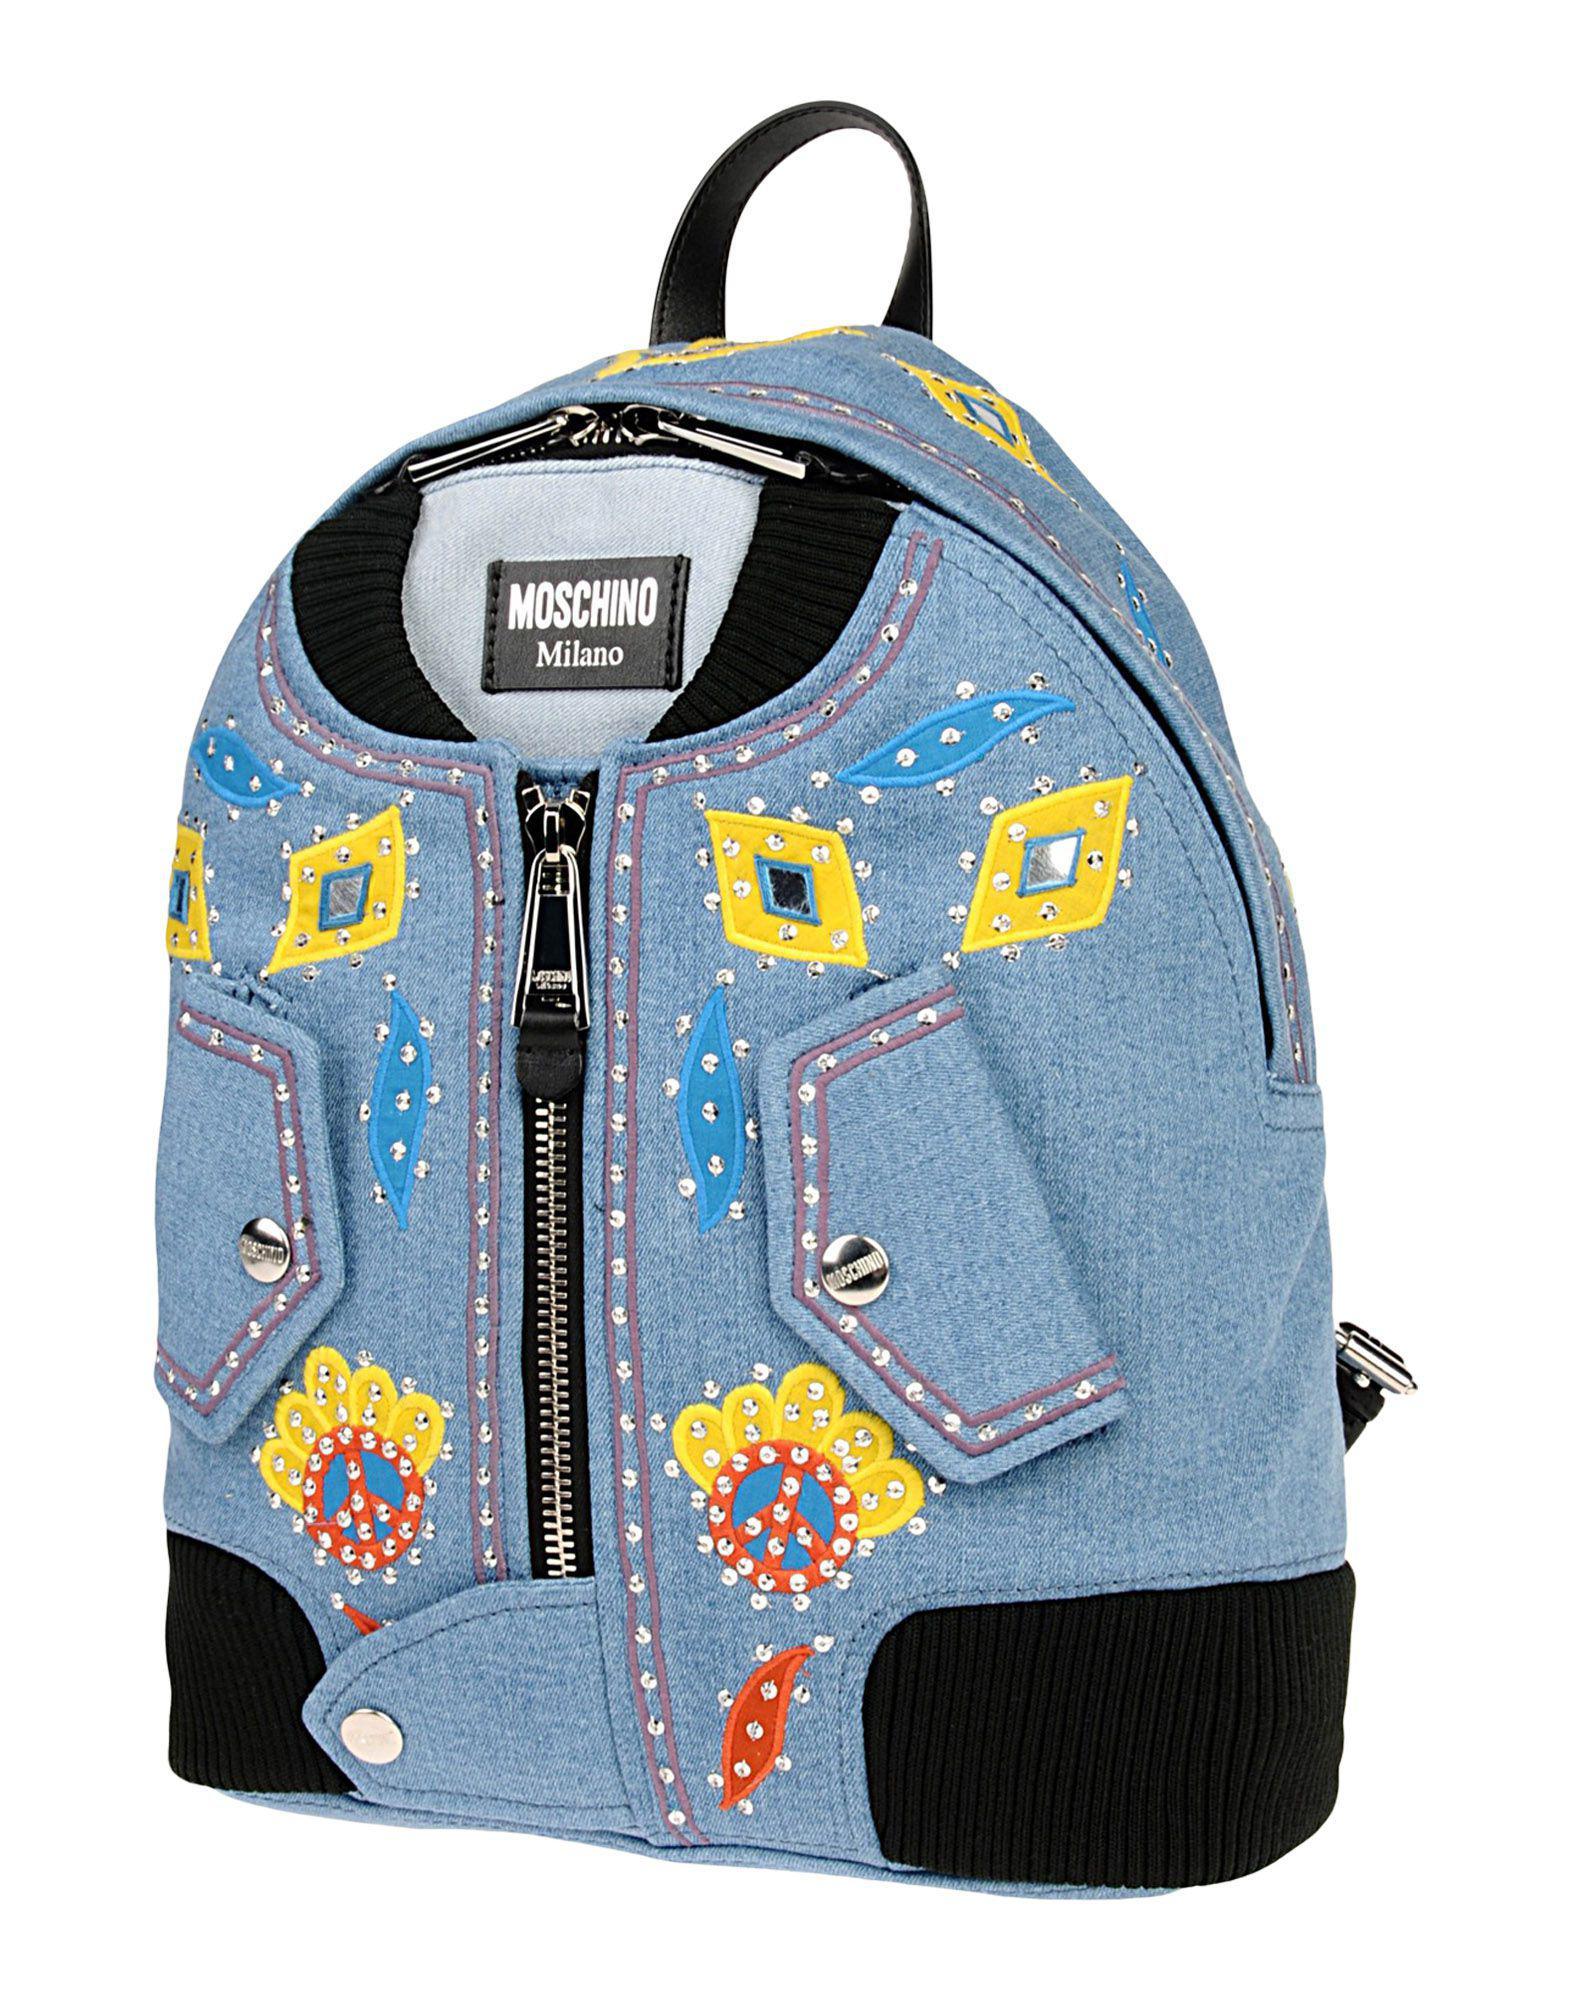 BAGS - Backpacks & Bum bags Moschino PekVlxH